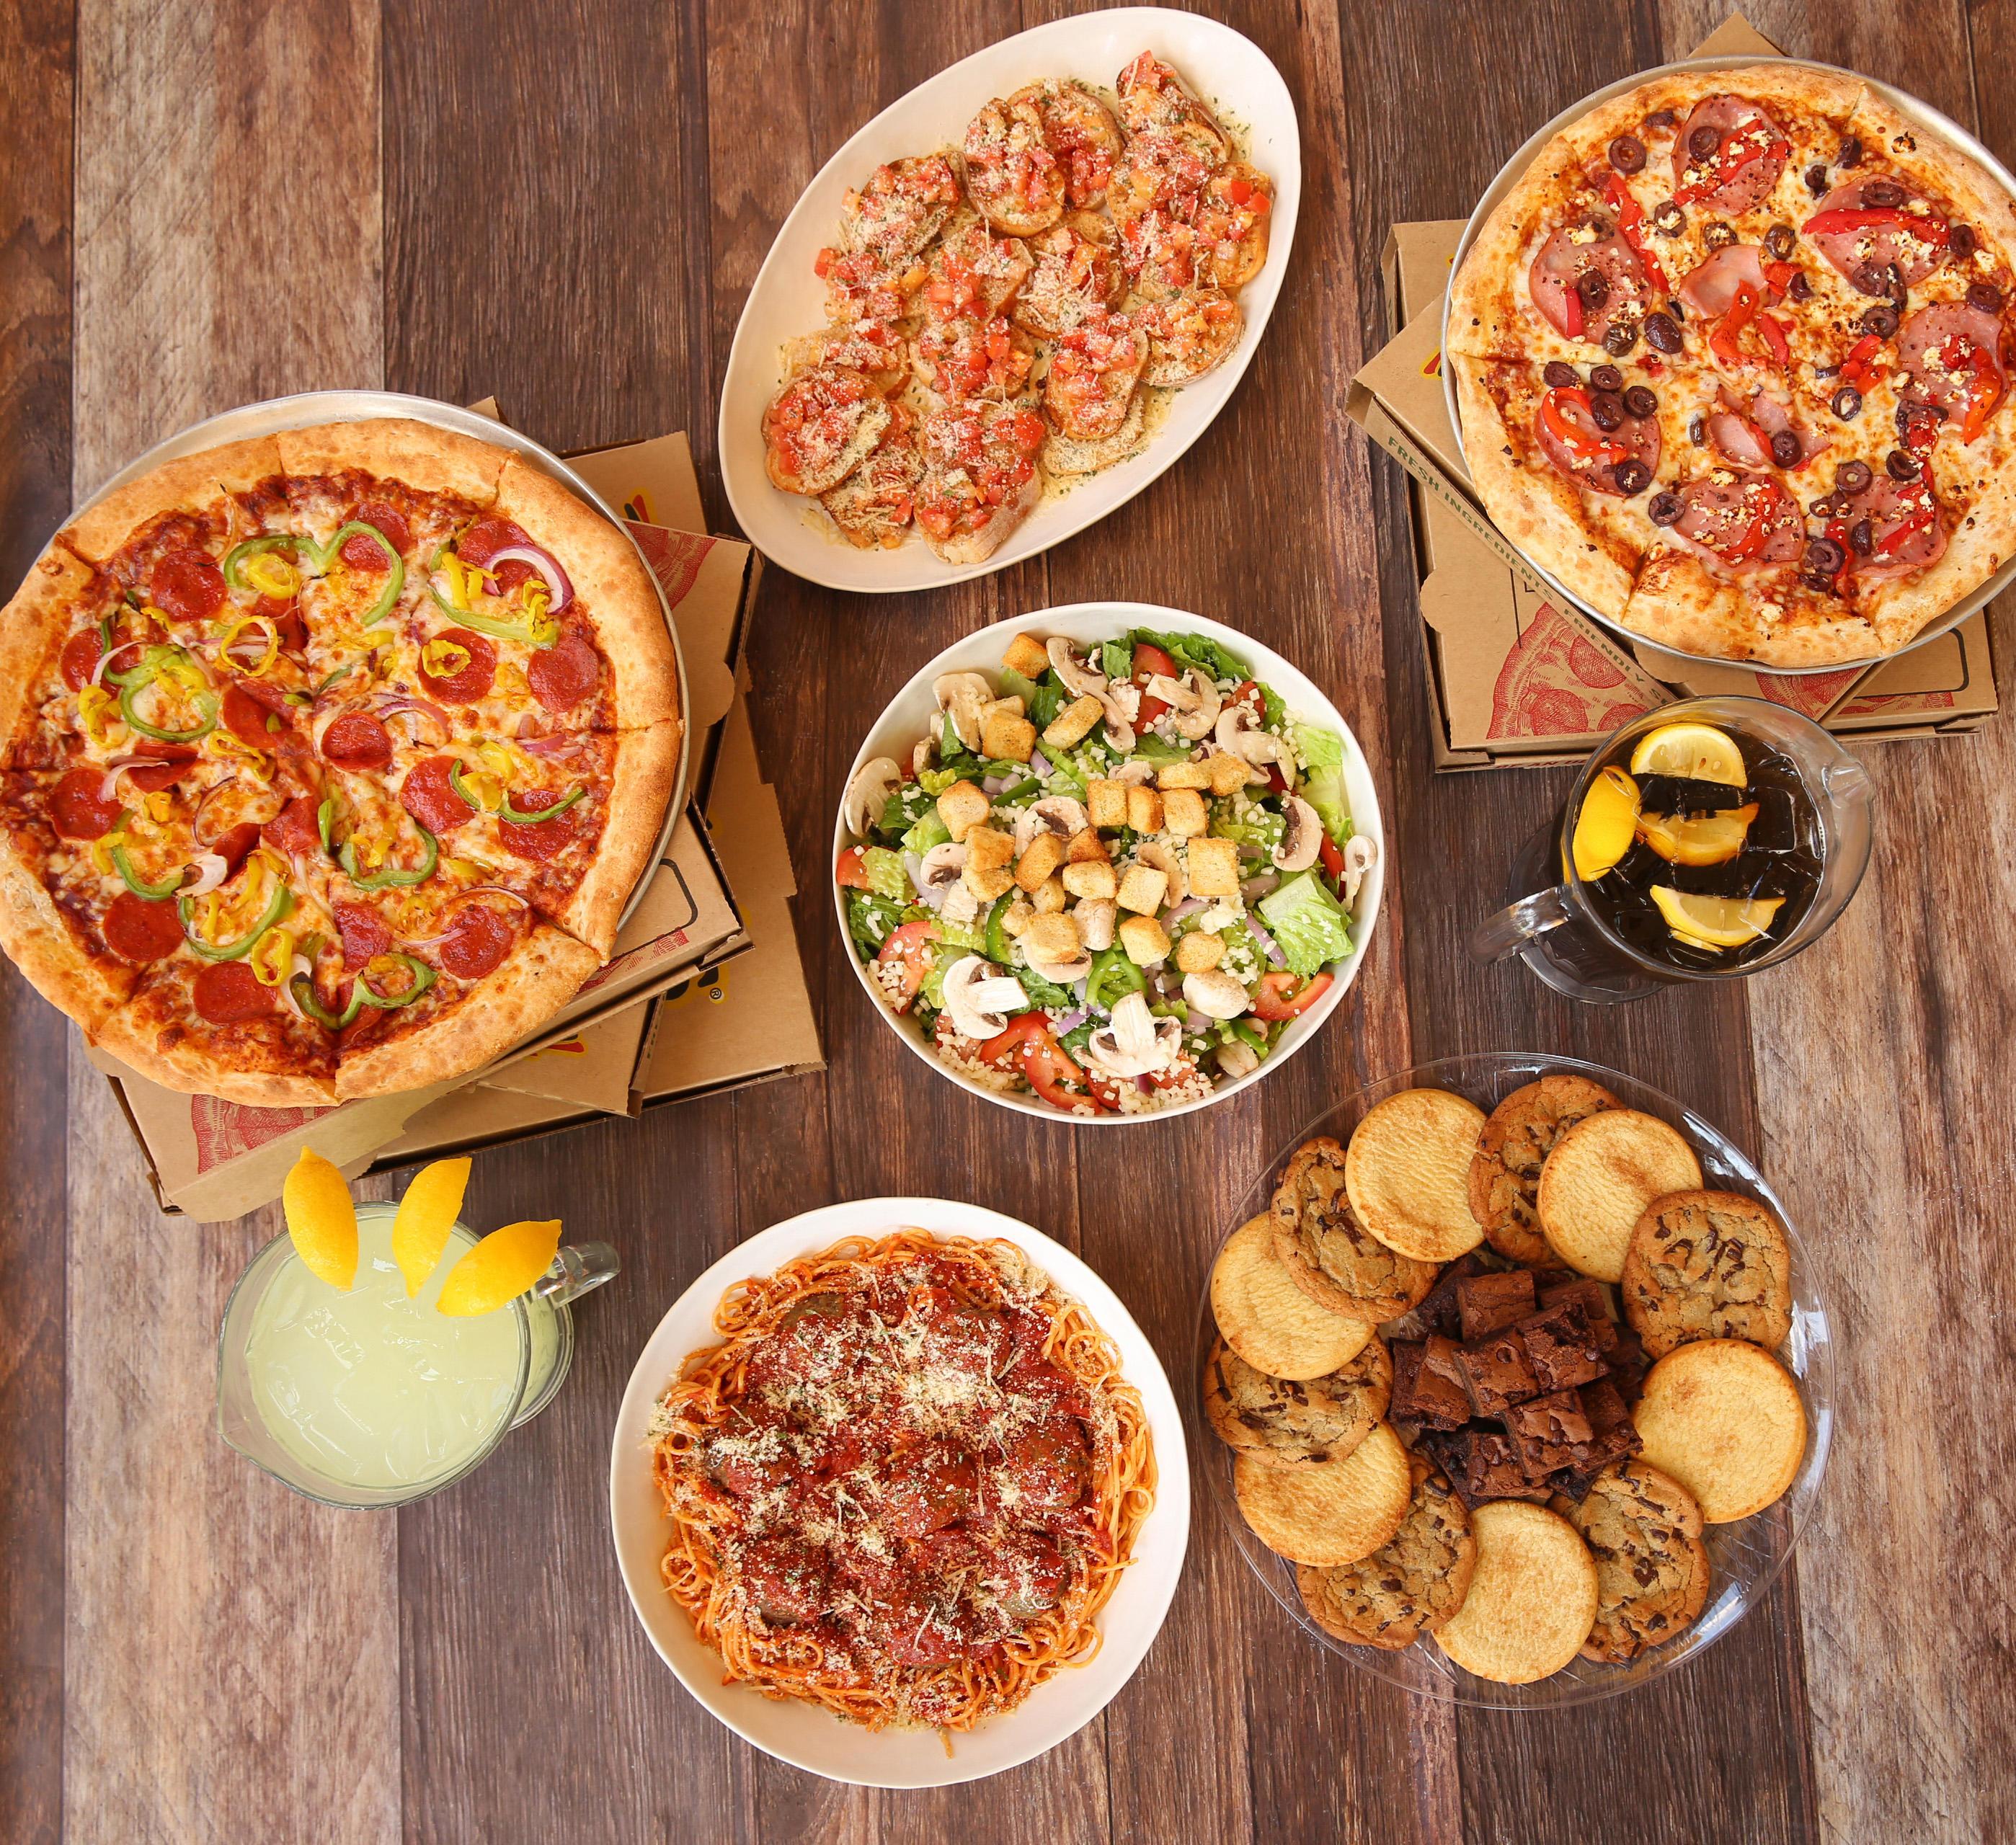 Rotolo's Pizzeria image 8